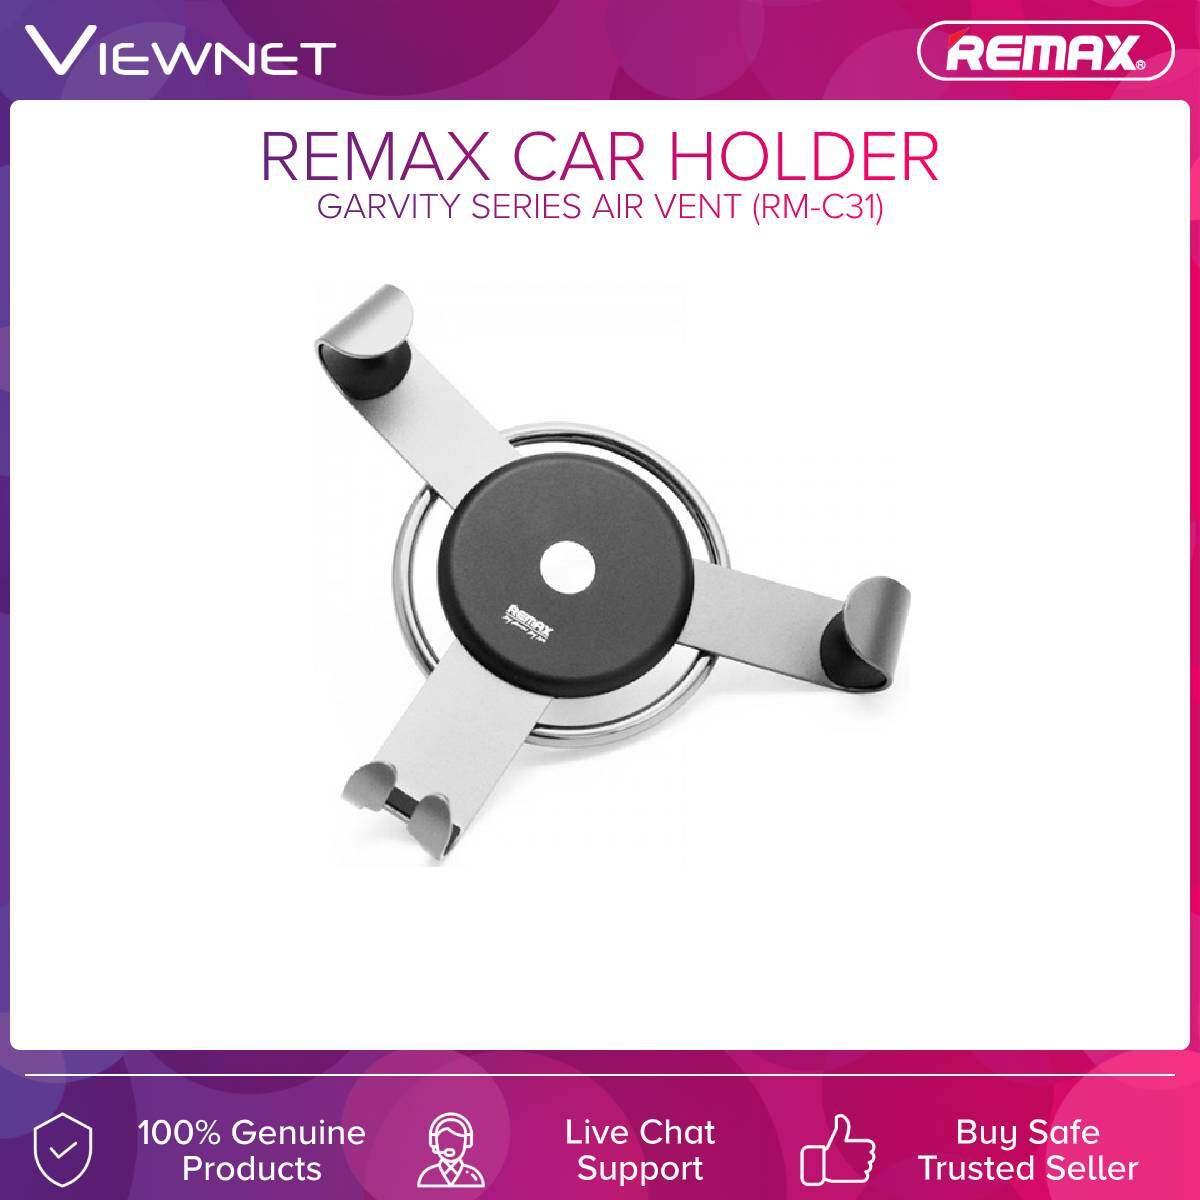 Remax (RM-C31) Car Holder Air Vent Gravity Series